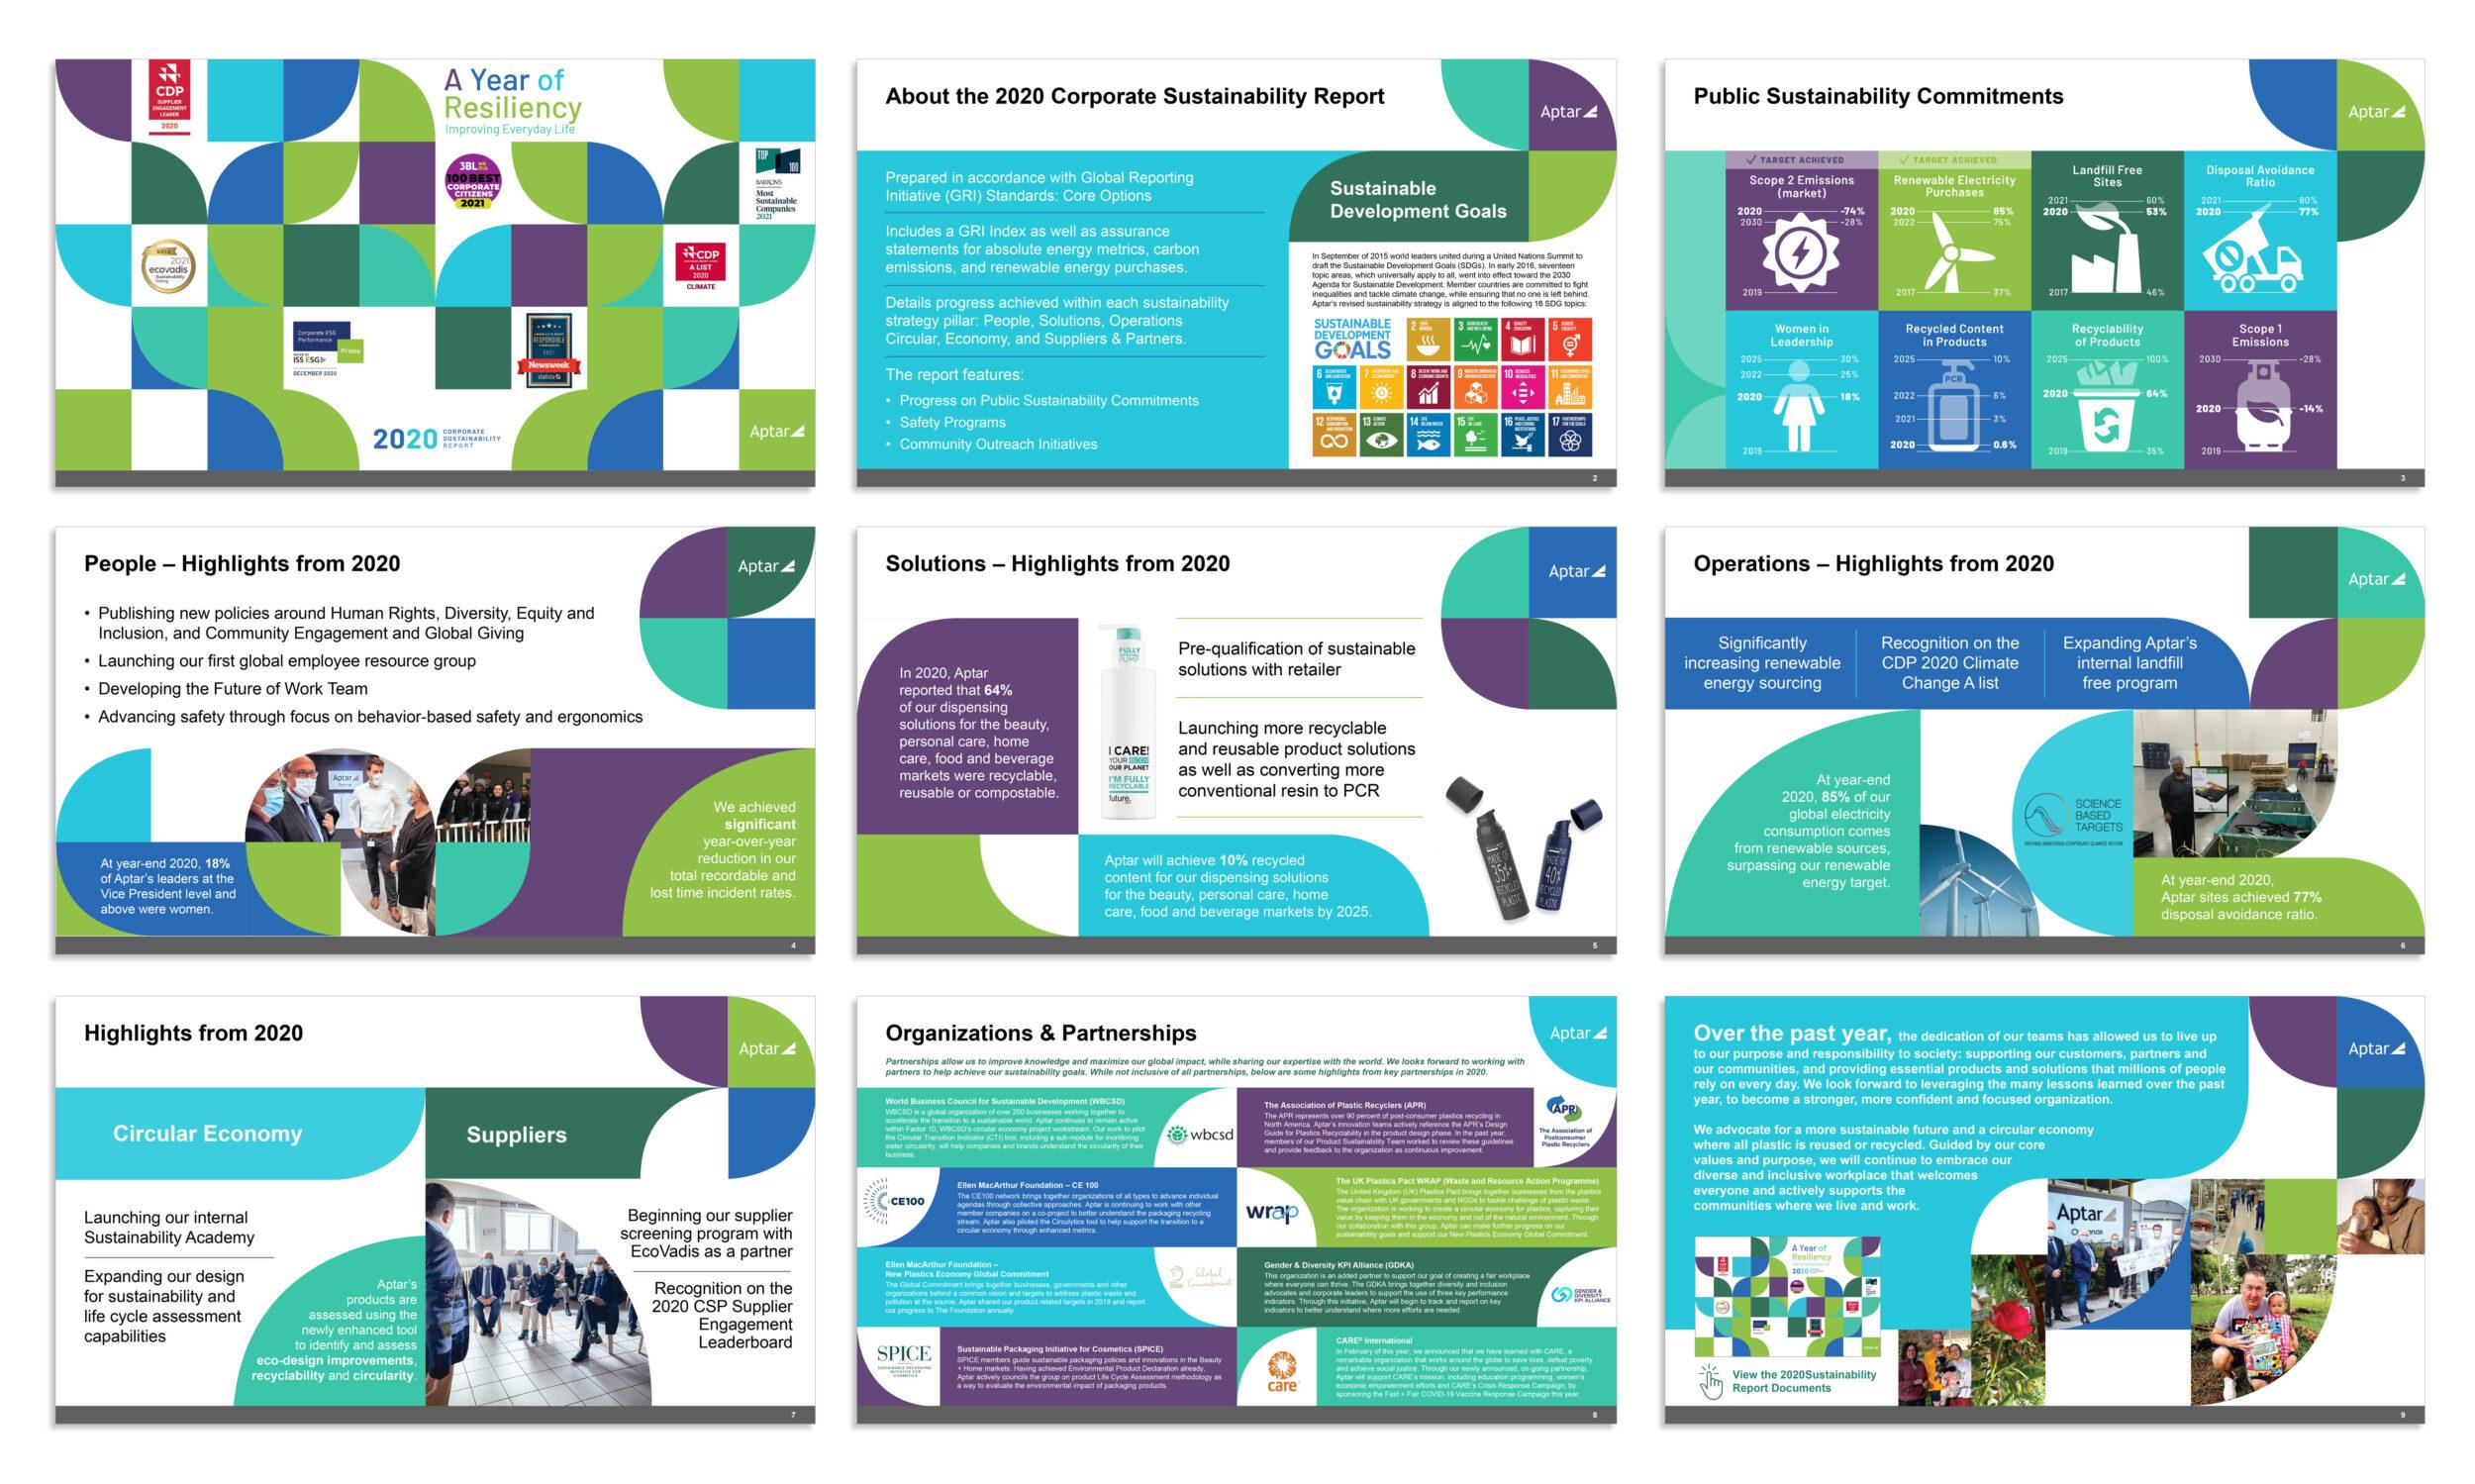 Slide presentation design by Virtual Apiary for APTAR